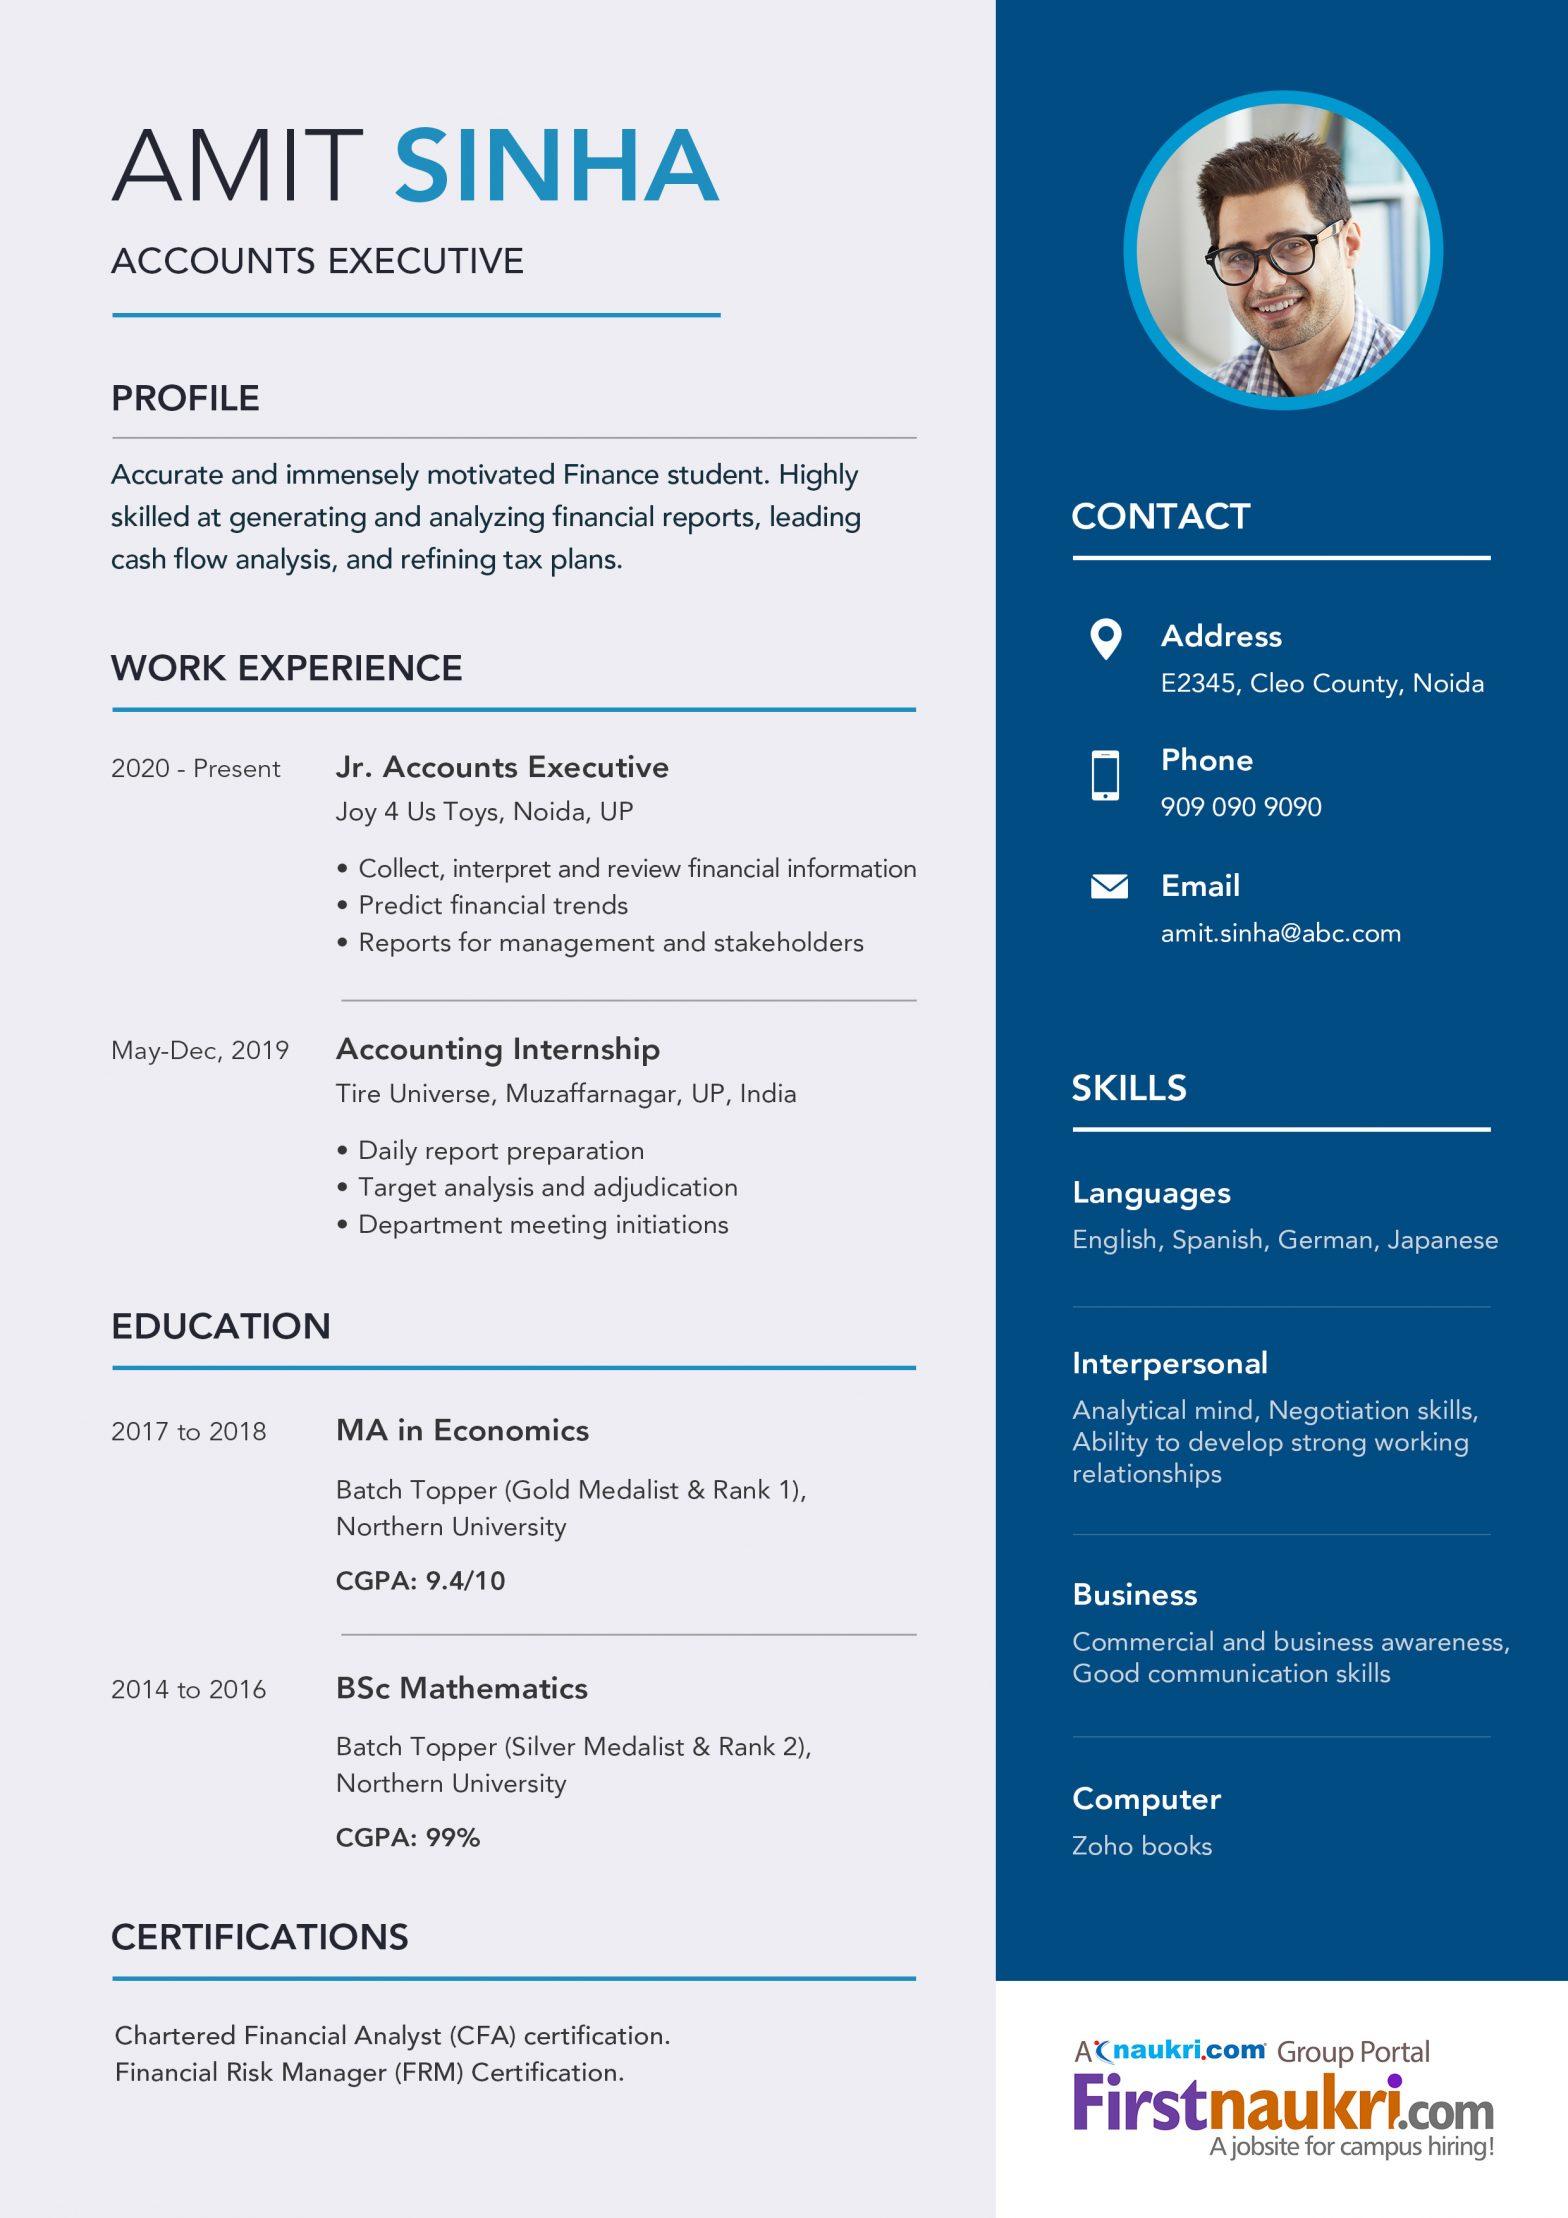 Resume Sample for Fresh Graduate Accounting Accounting Resume Sample 2020 Career Guidance